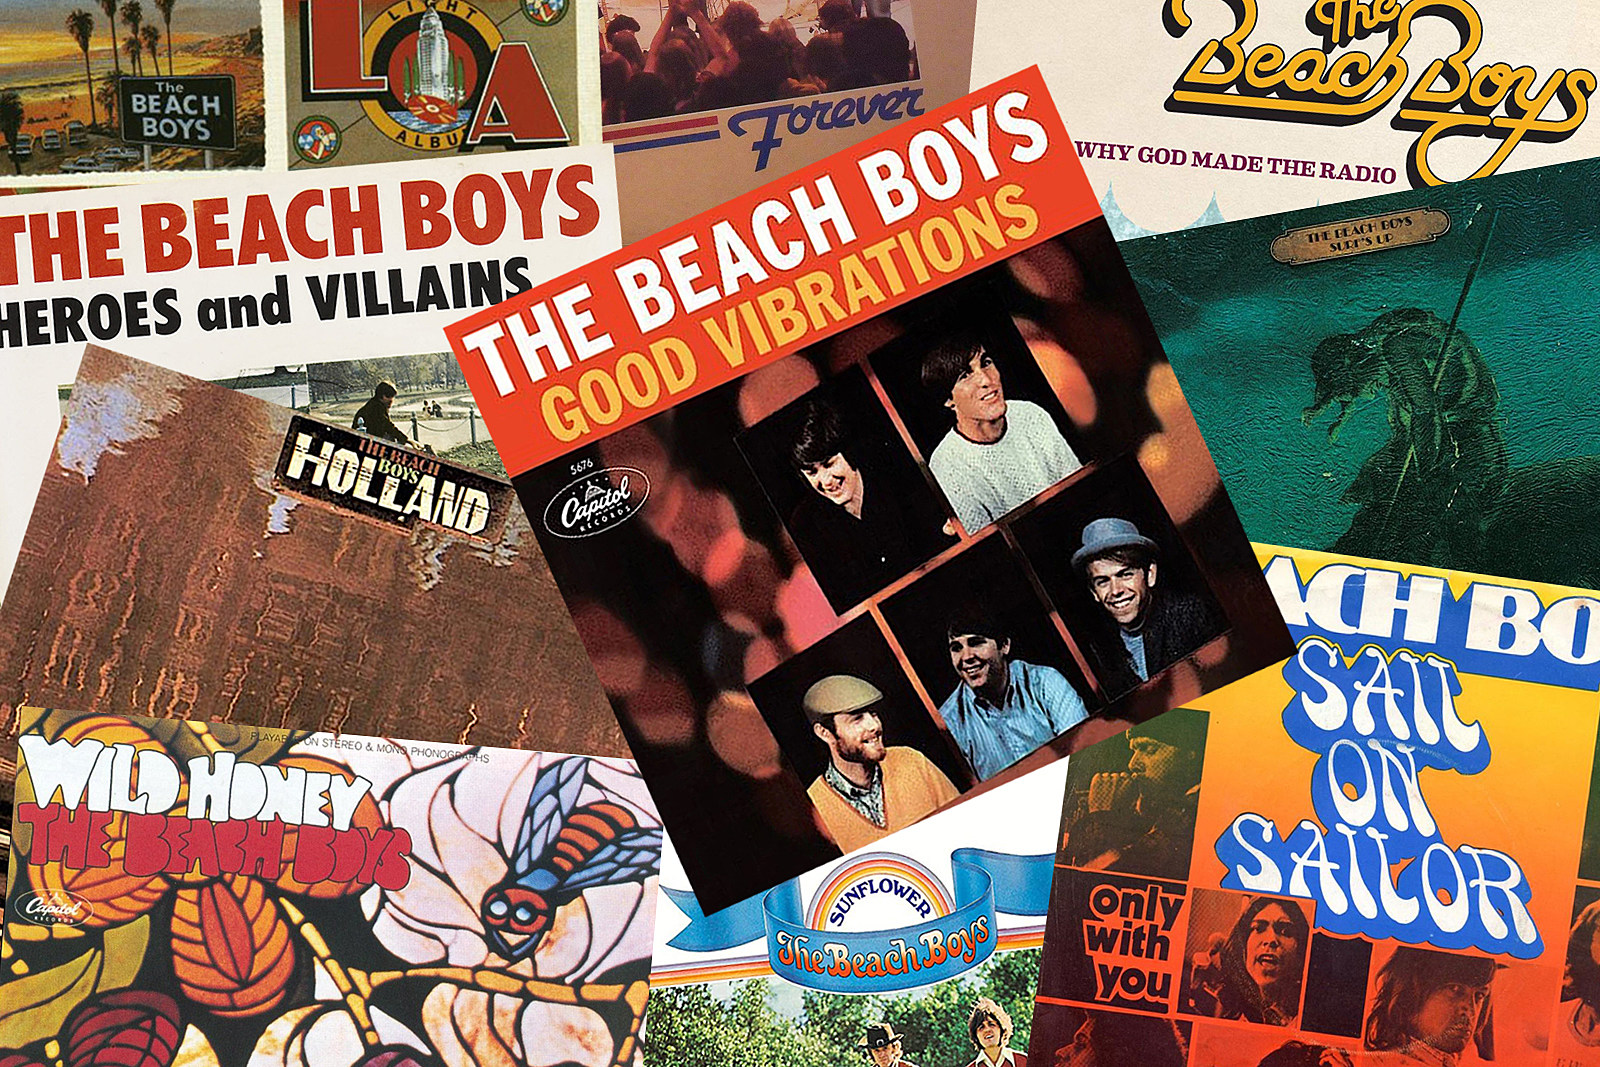 Top 10 Post-'Pet Sounds' Beach Boys Songs